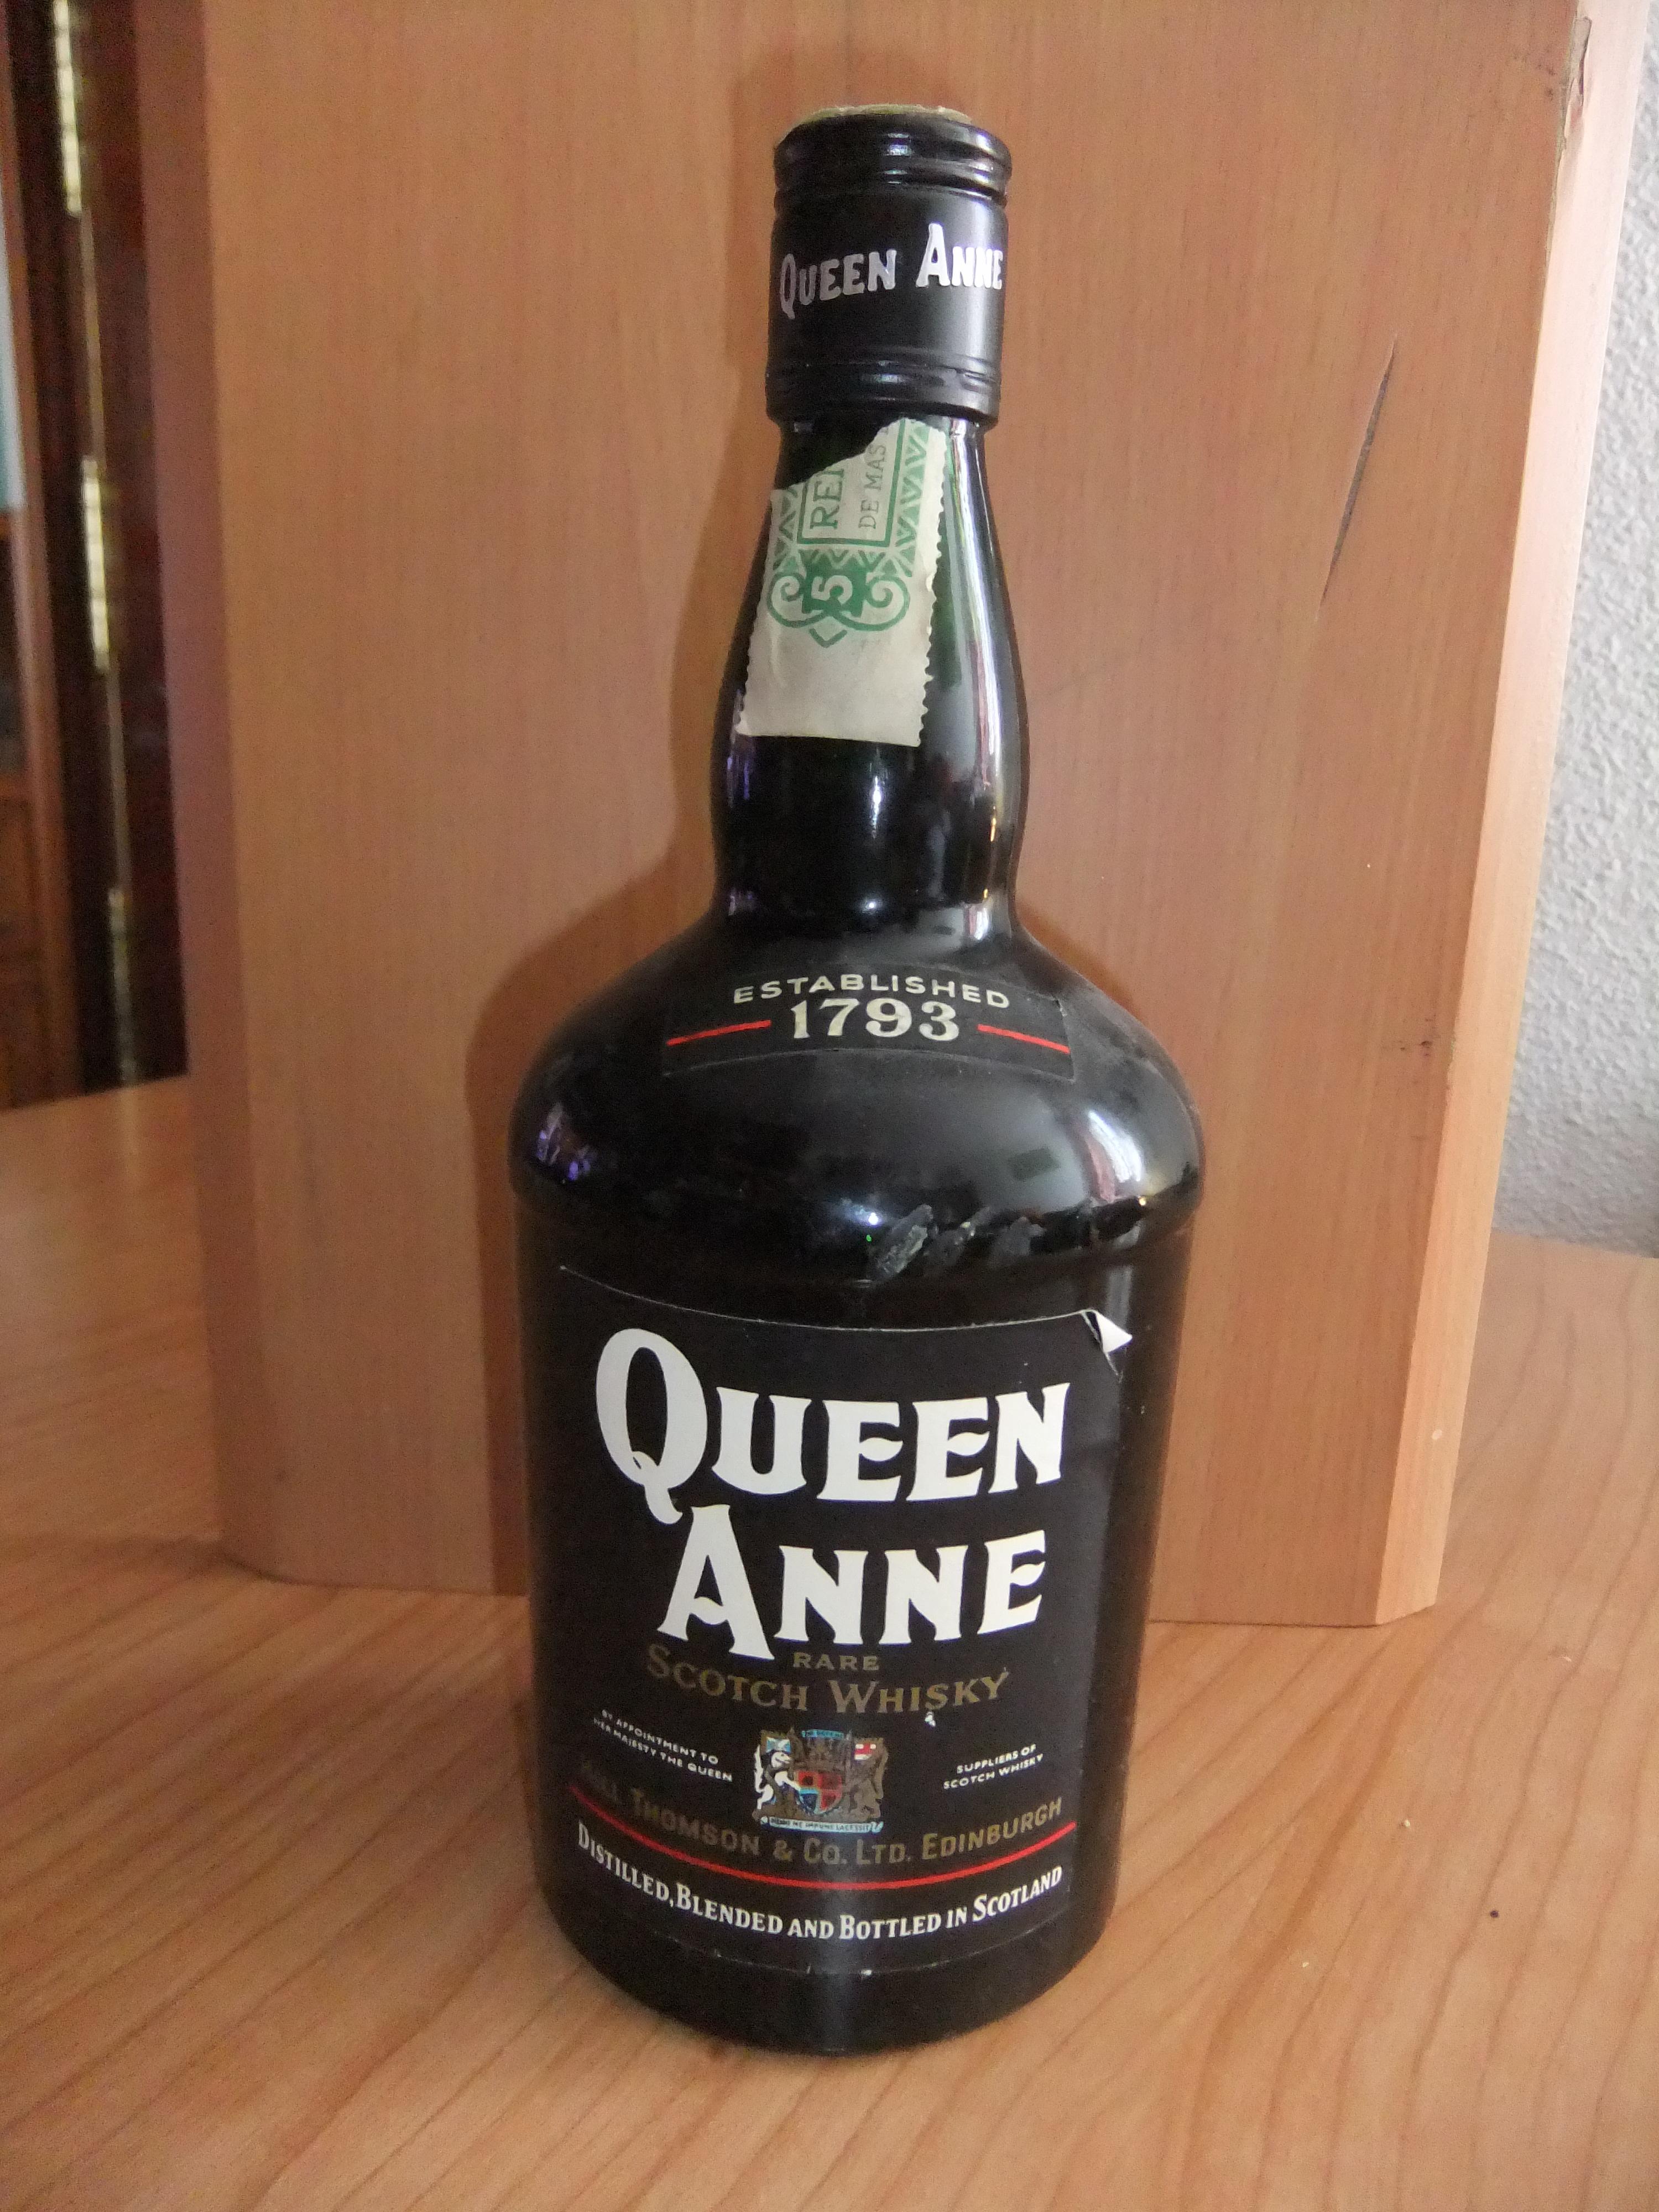 Queen Anne's Scotch Whisky